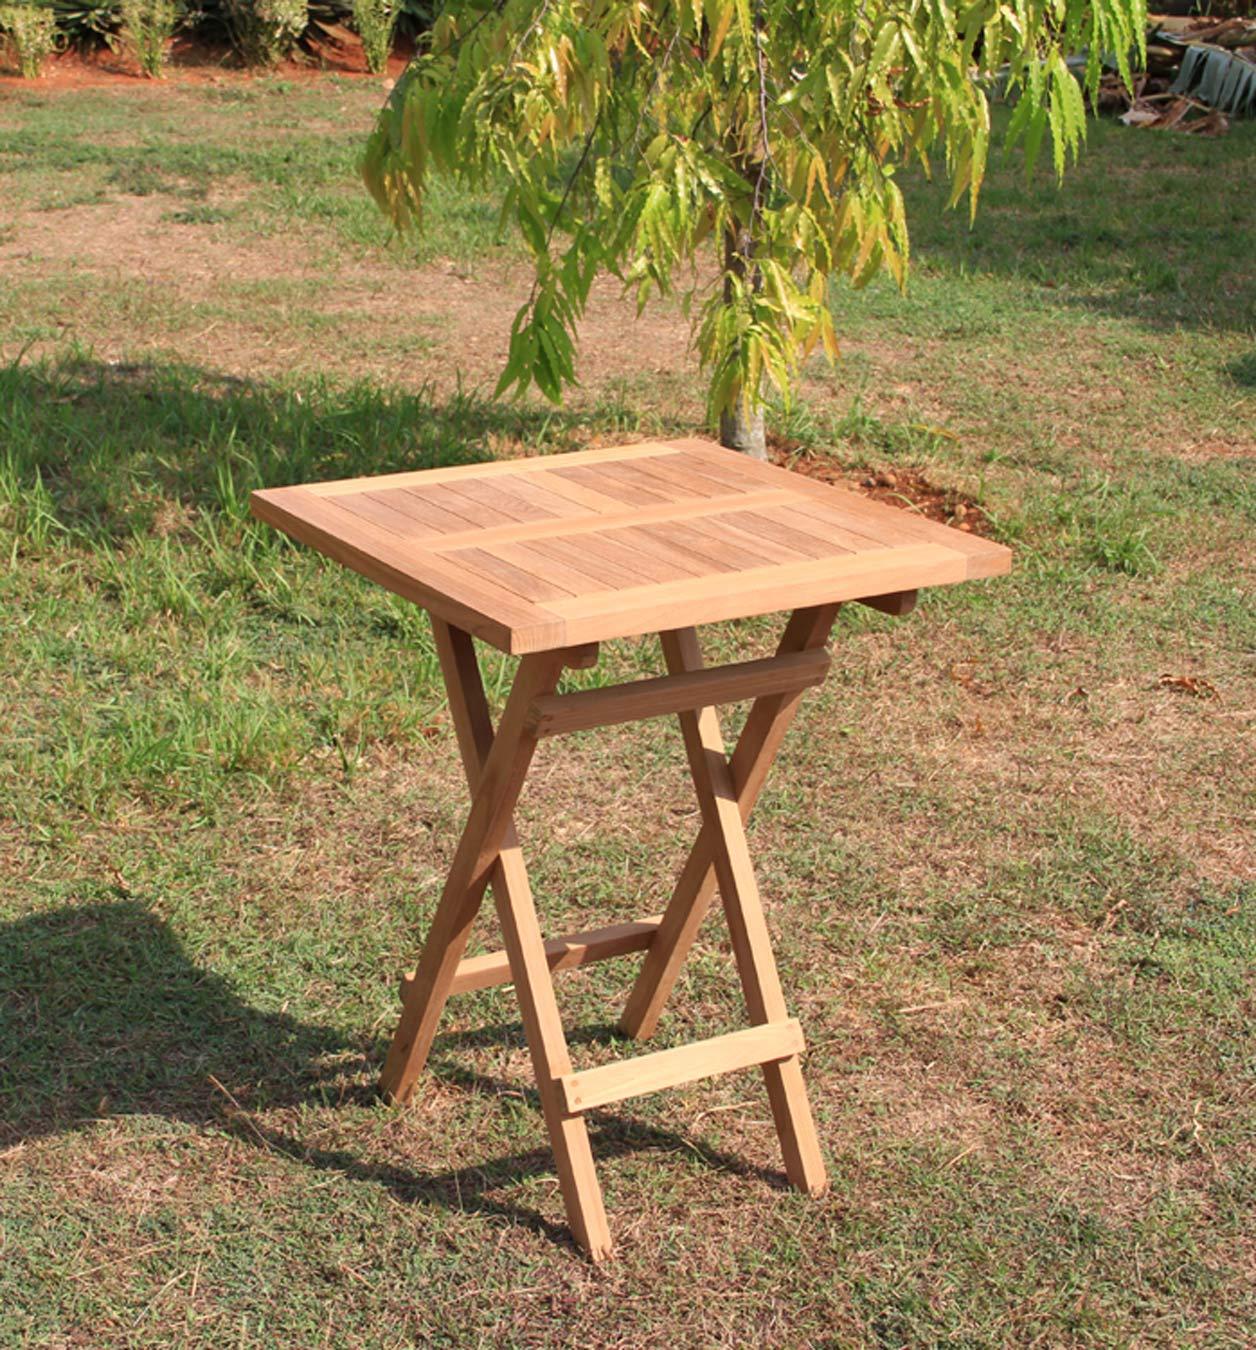 Klapptisch Gartentisch 60 X 60 Cm In Premium Teak